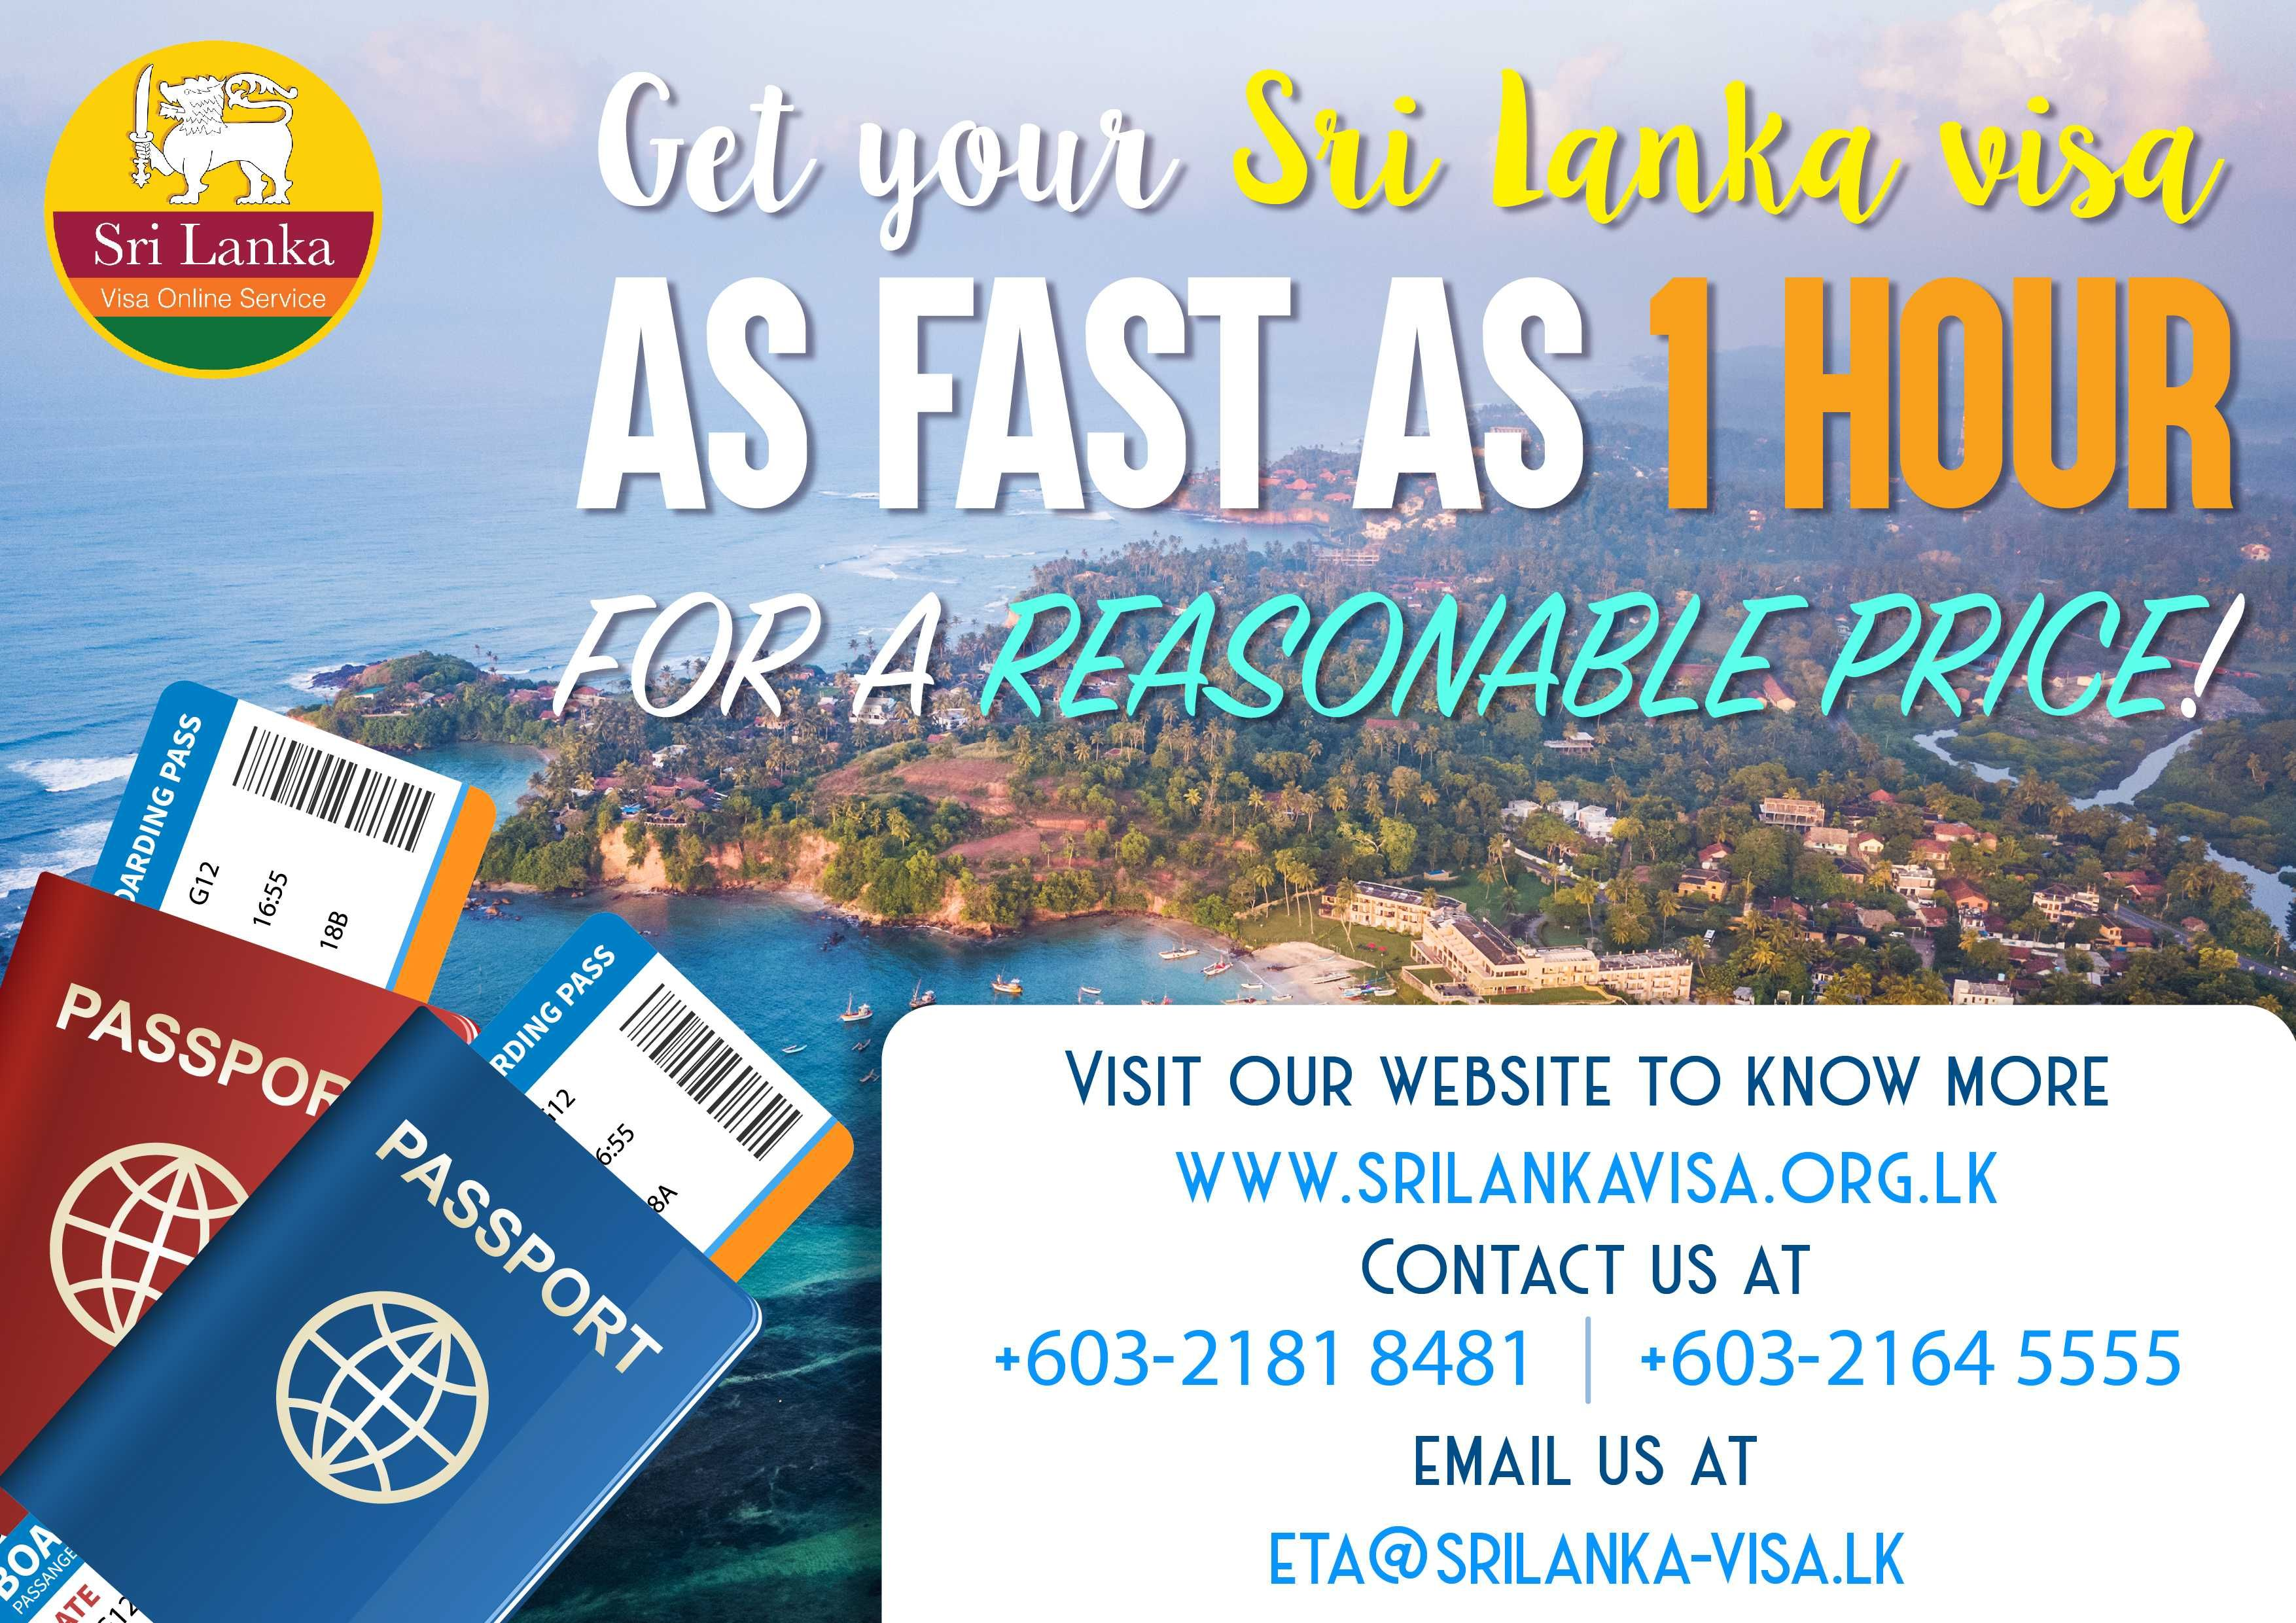 Sri Lanka Visa Online Sri Lankan Evisa Services Visa Service Provider Visa Online Passport Information Visa